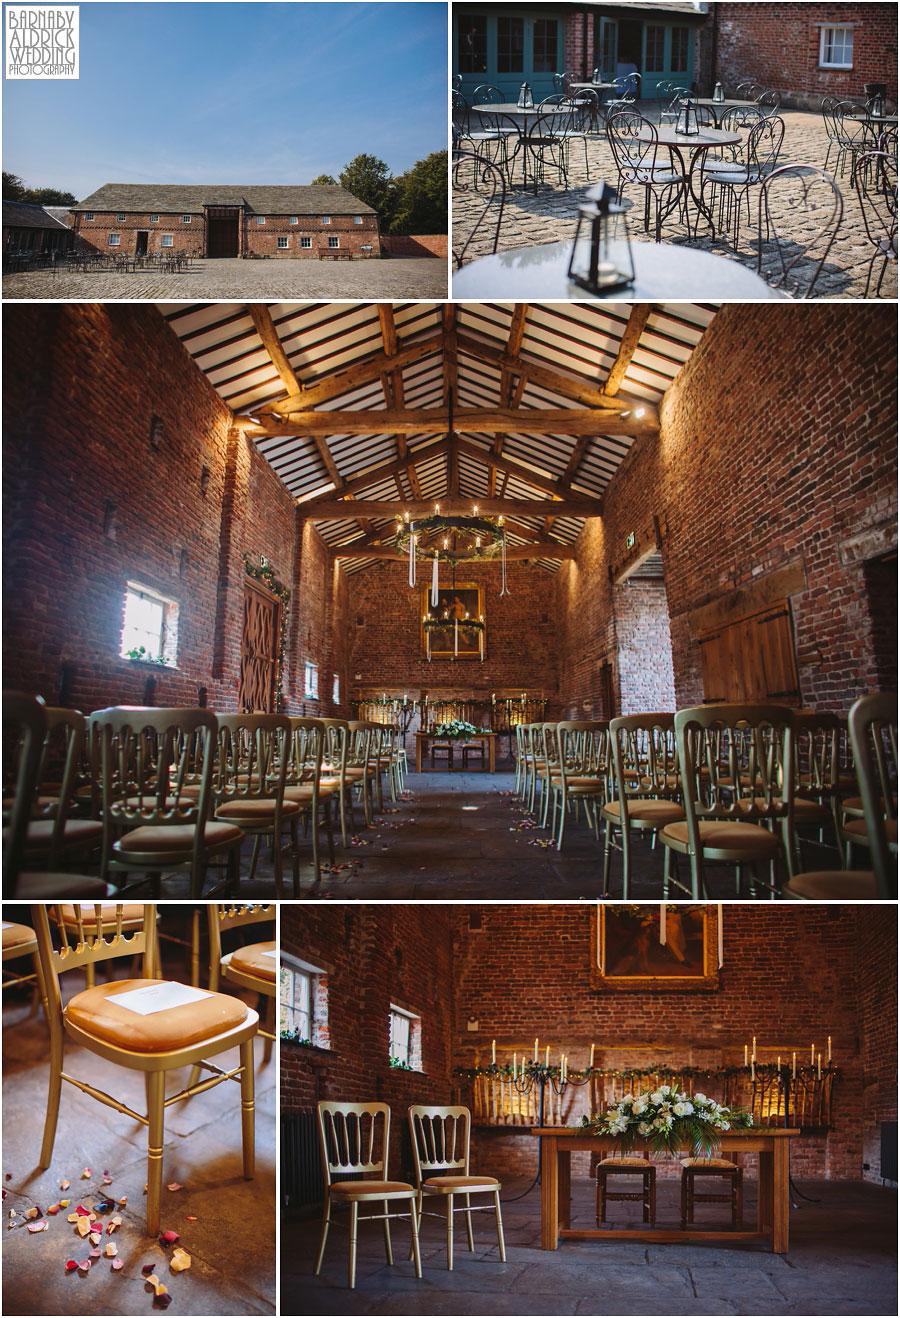 Meols Hall Churchtown Wedding Photography by Barnaby Aldrick Wedding Photographer 020.jpg